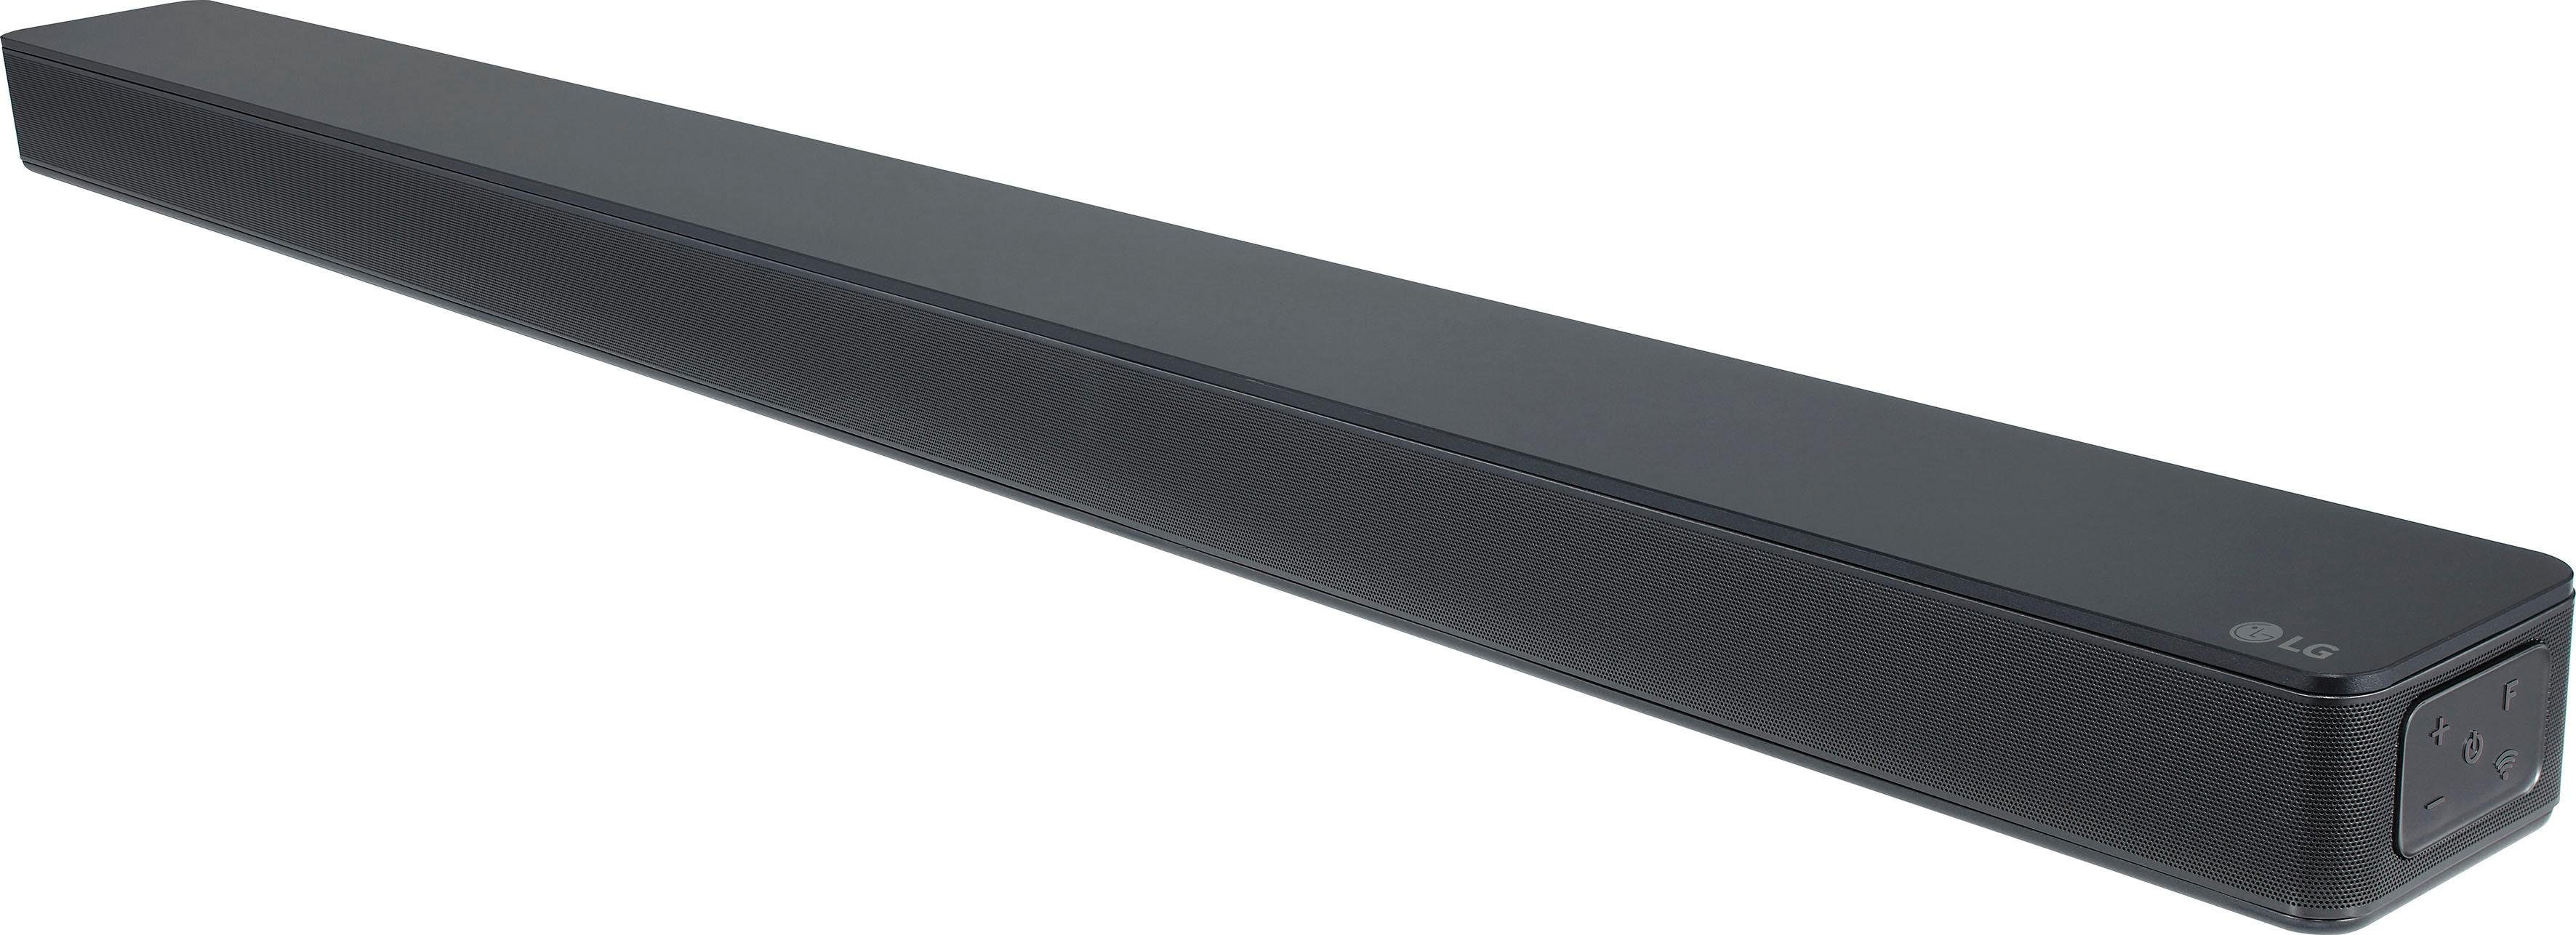 LG SK6F 2.1 Soundbar (Bluetooth, WLAN (WiFi), LAN (Ethernet), Chromecast, Hi-Res, Google Assistant, Sprachsteuerung, 360 W)